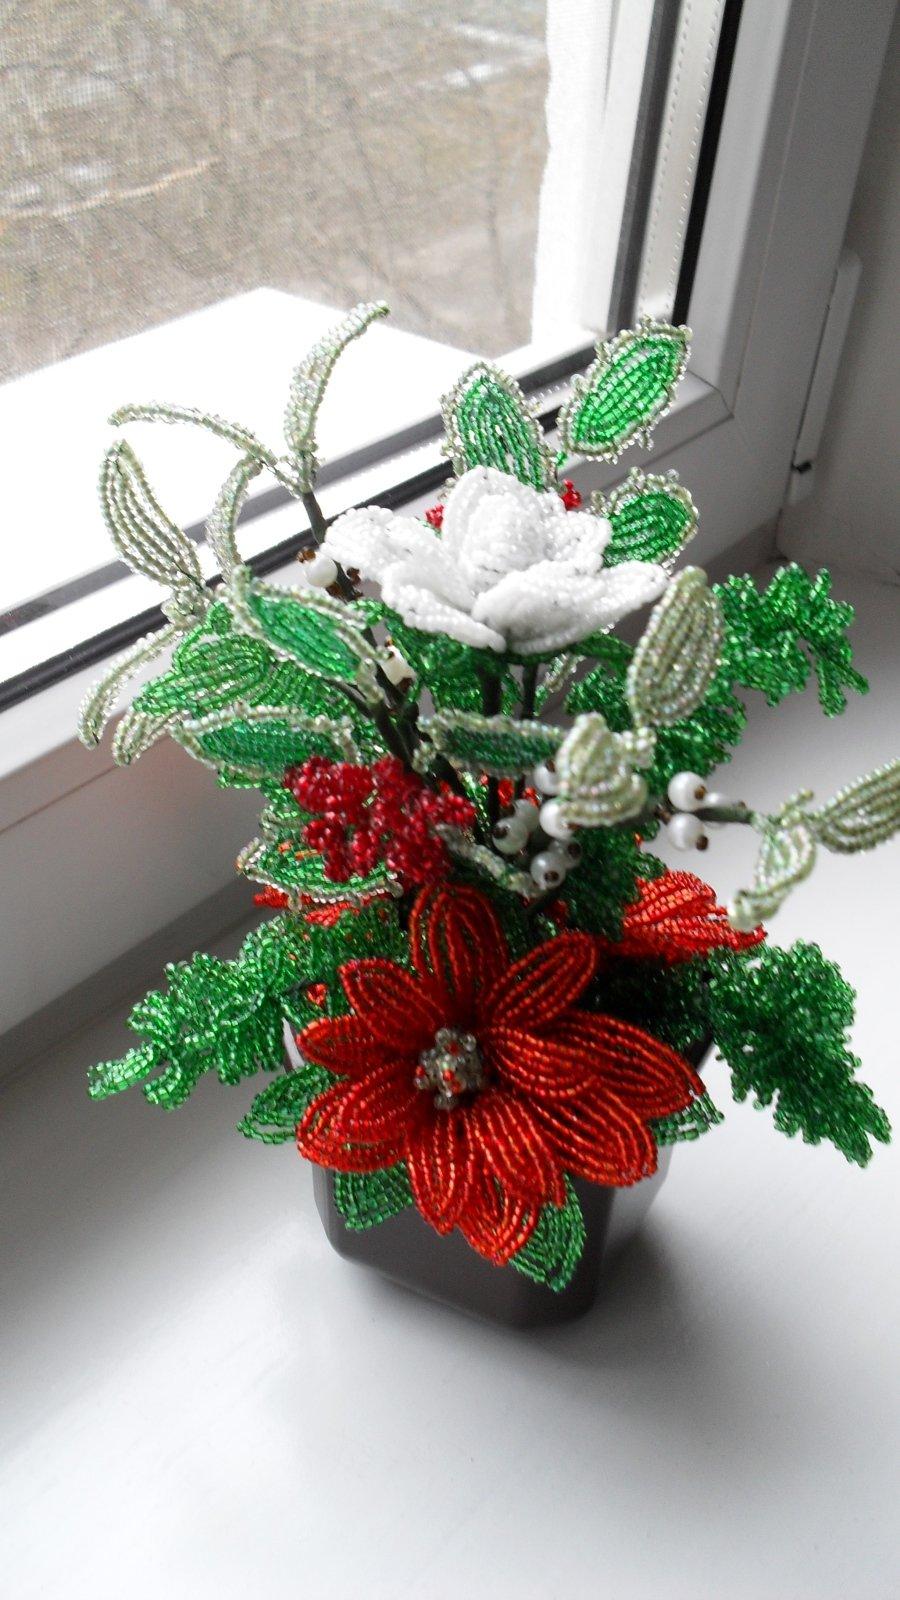 Снежинки из бисера для детей. снежинки из бисера своими руками со схемами, фото и видео